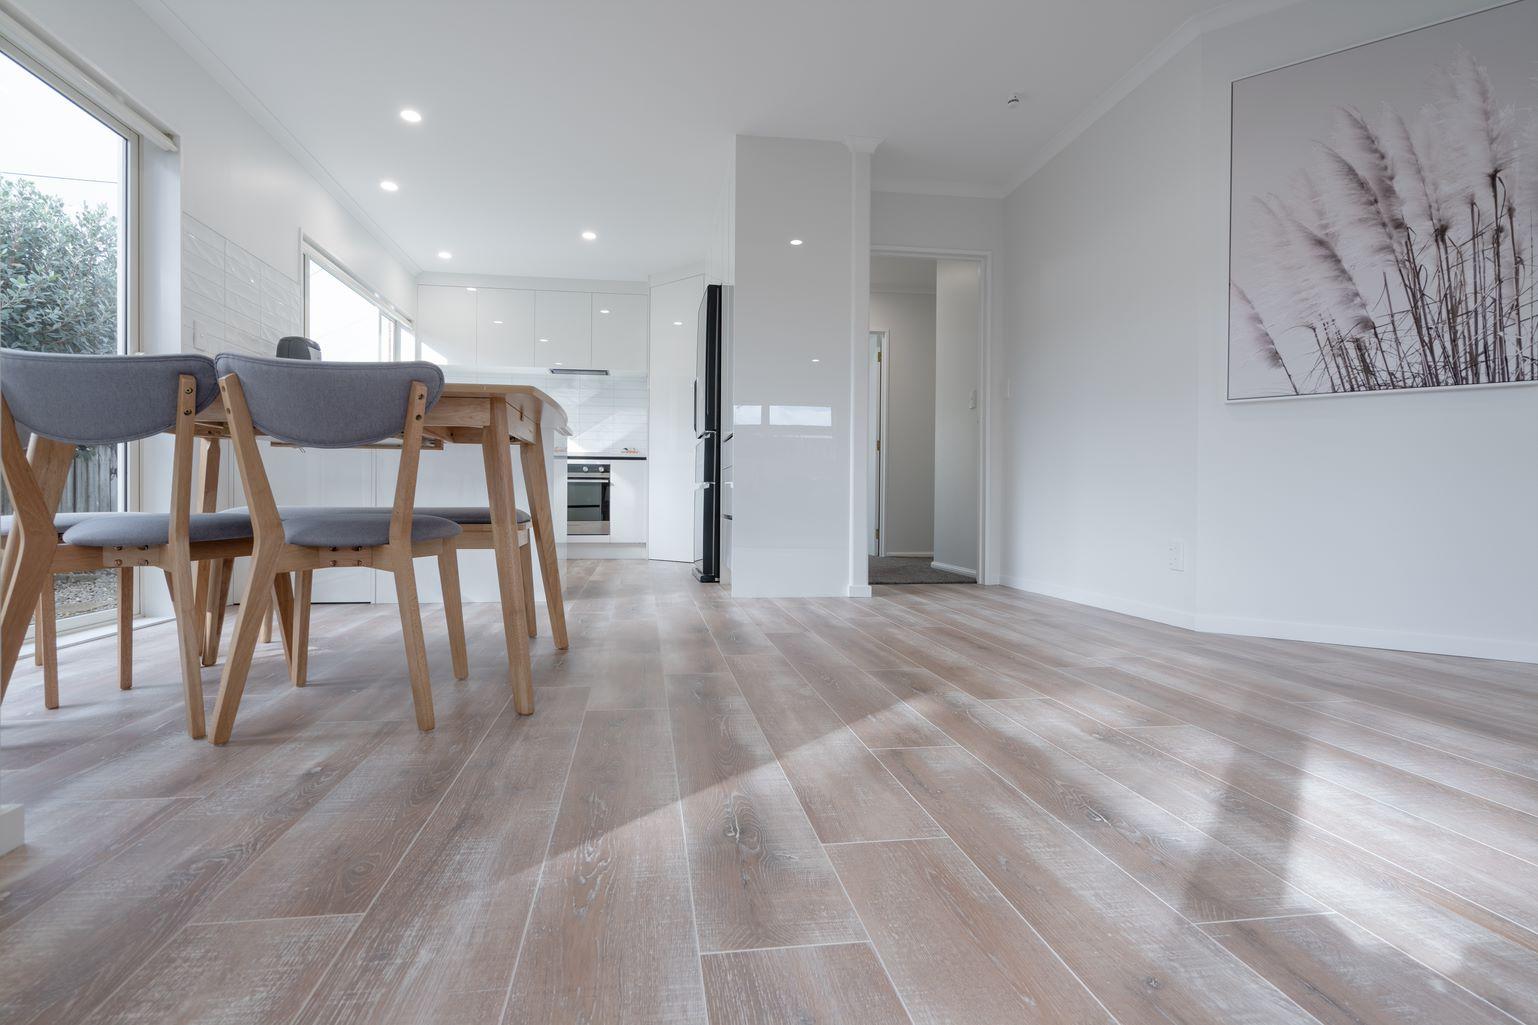 laminate flooring - perfect choice for beach house living areas